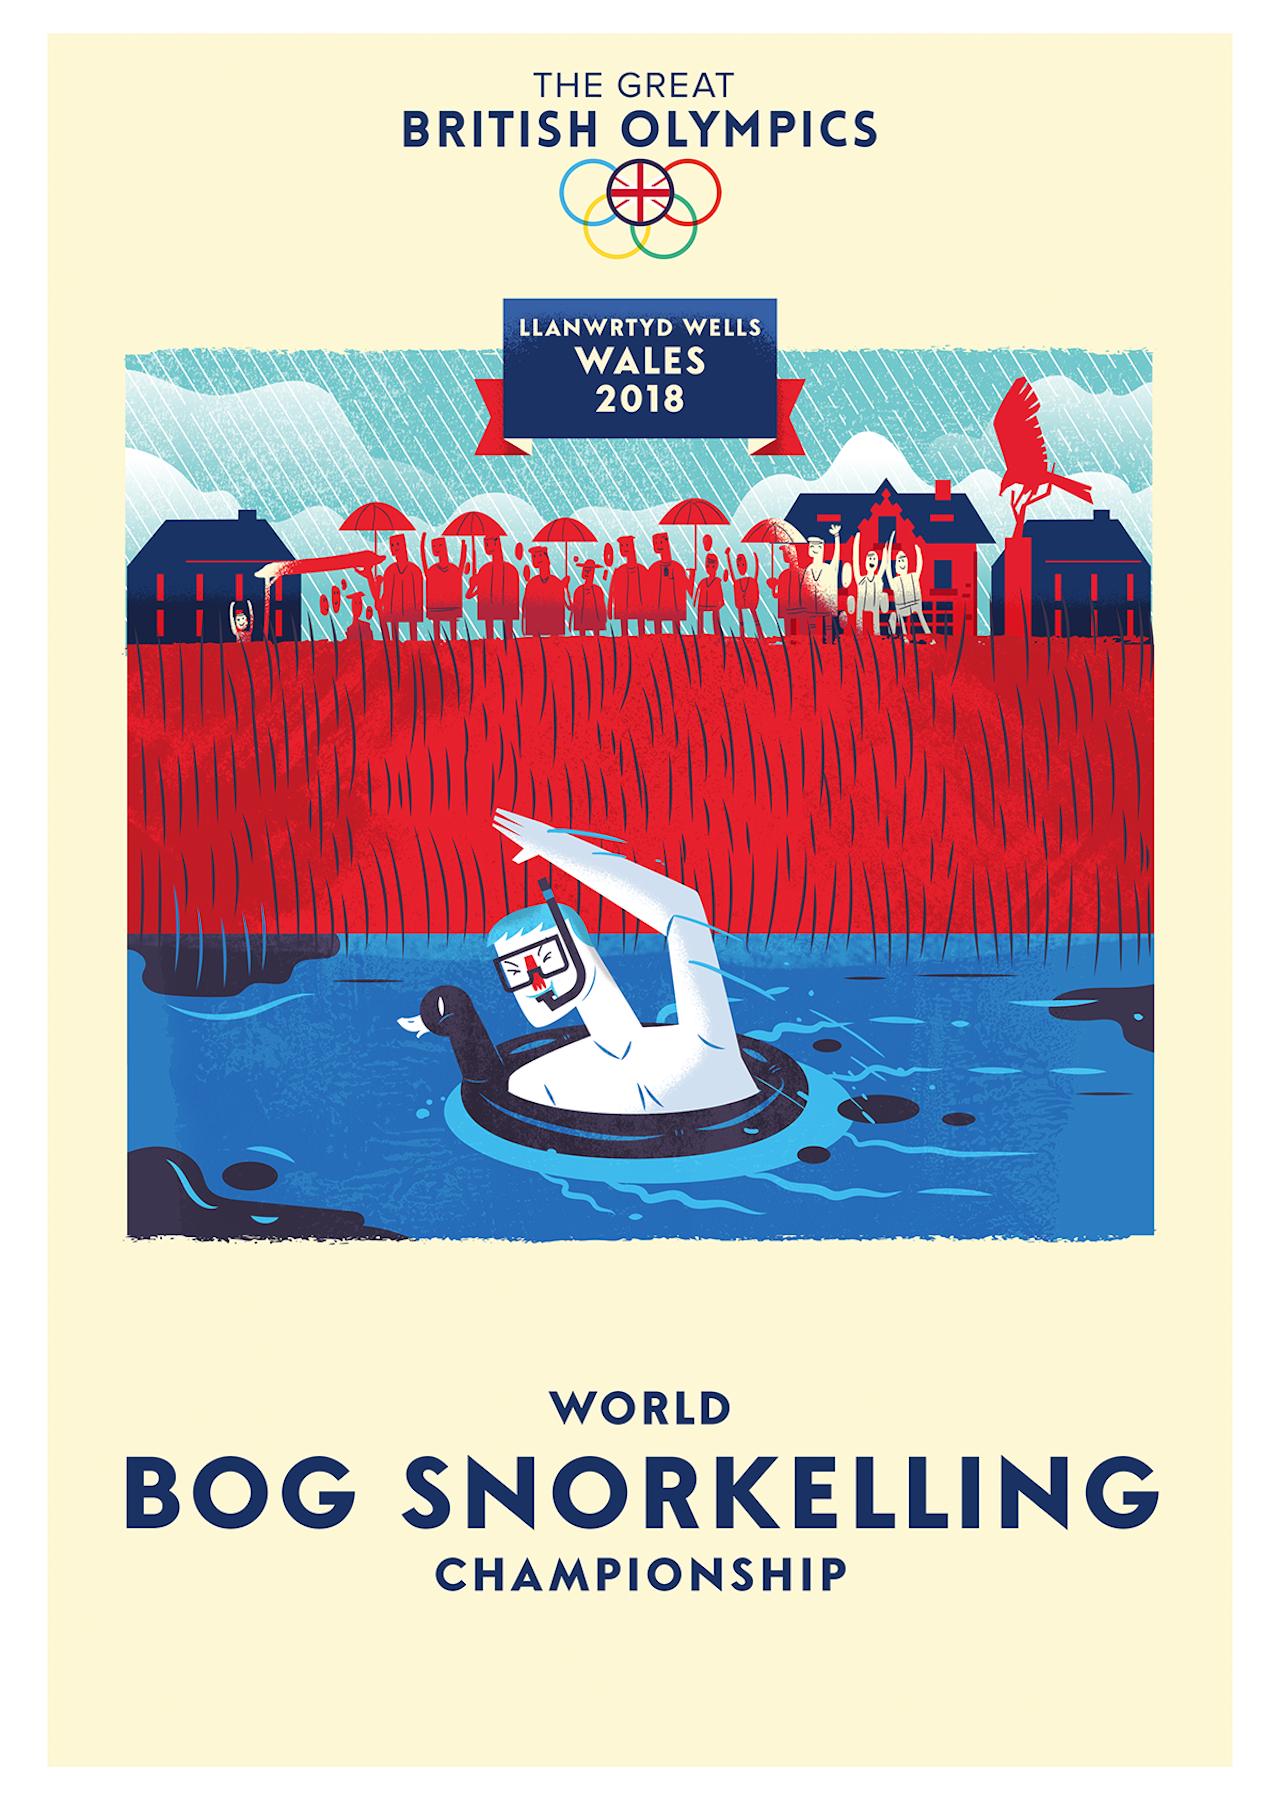 British Olympics_02 Bog Snorkelling